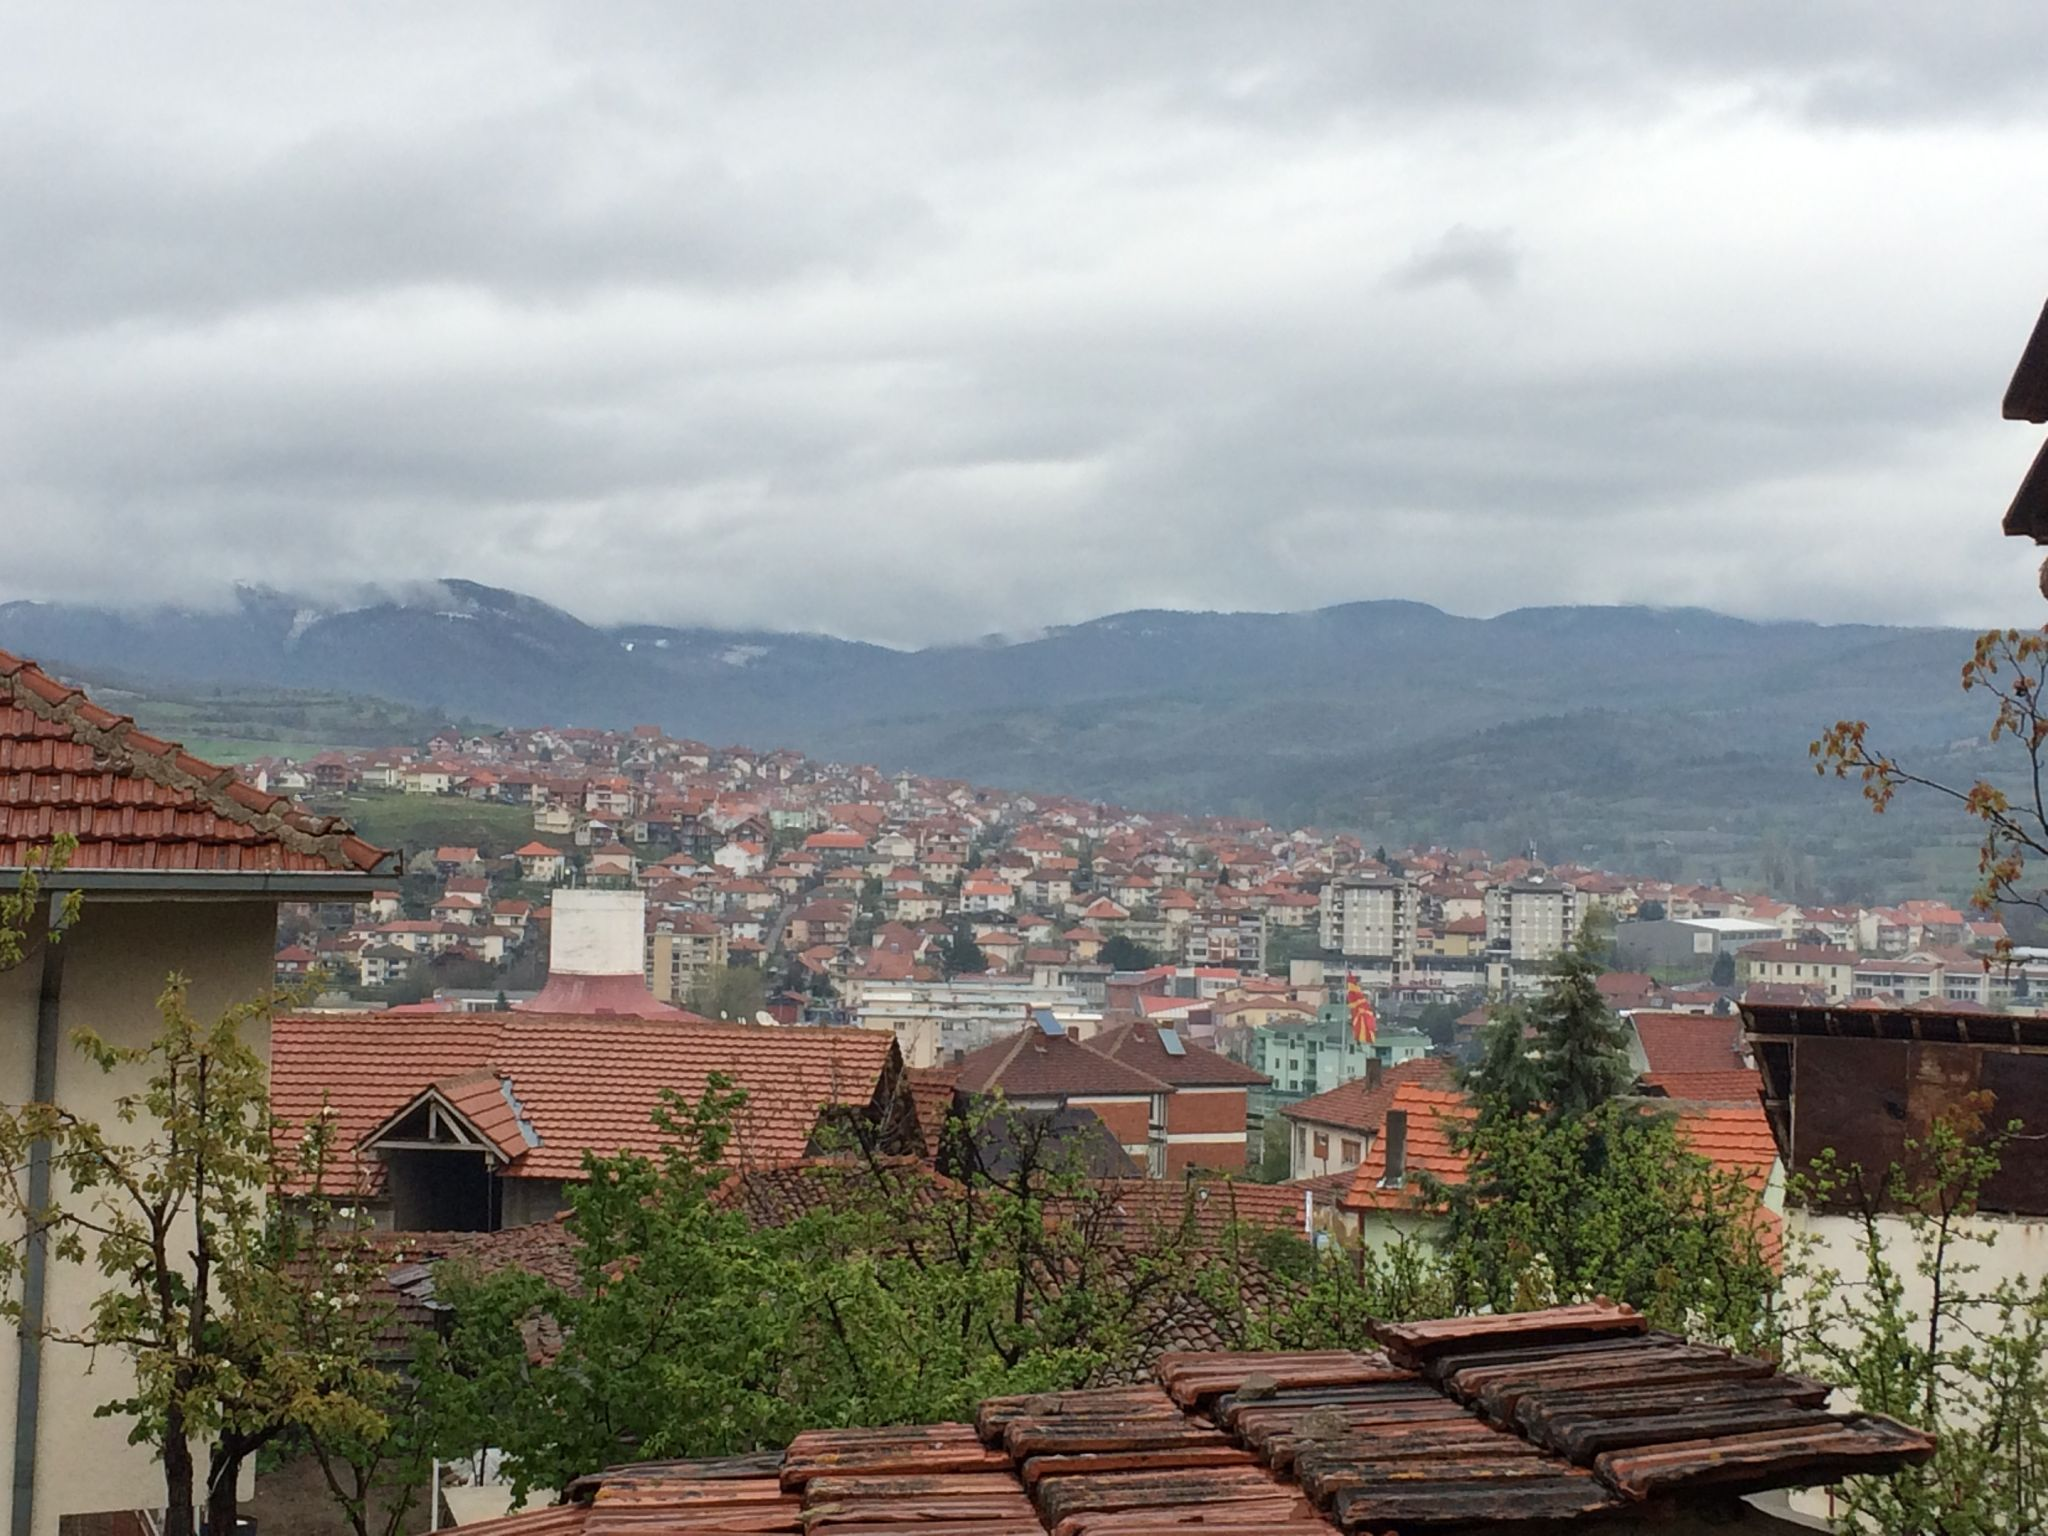 IMG 0350 - Macedonian landscapes